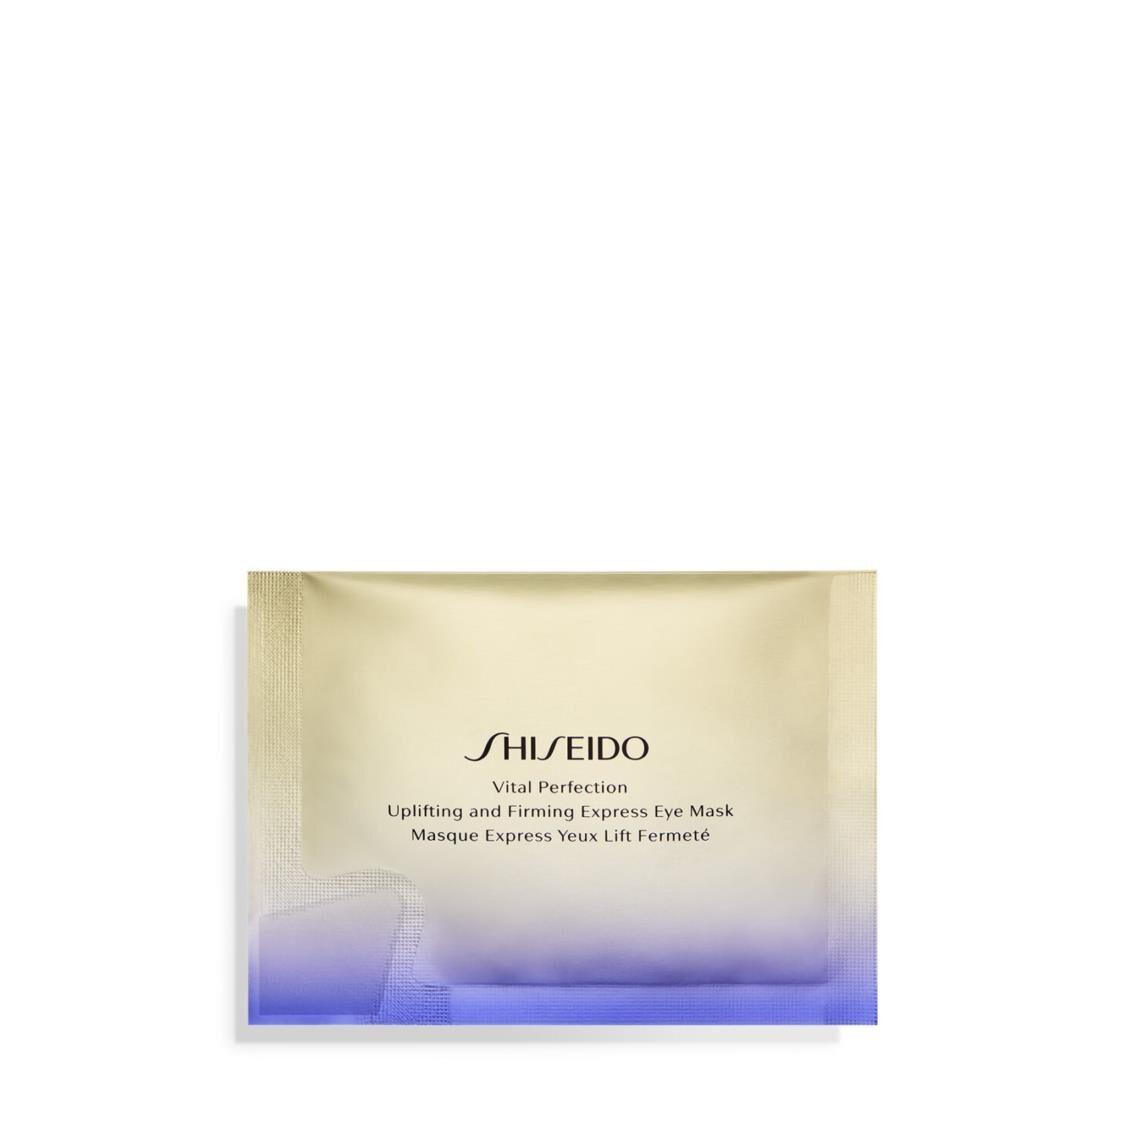 Shiseido Vital Perfection Uplifting and Firming Express Eye Mask 12 sheets